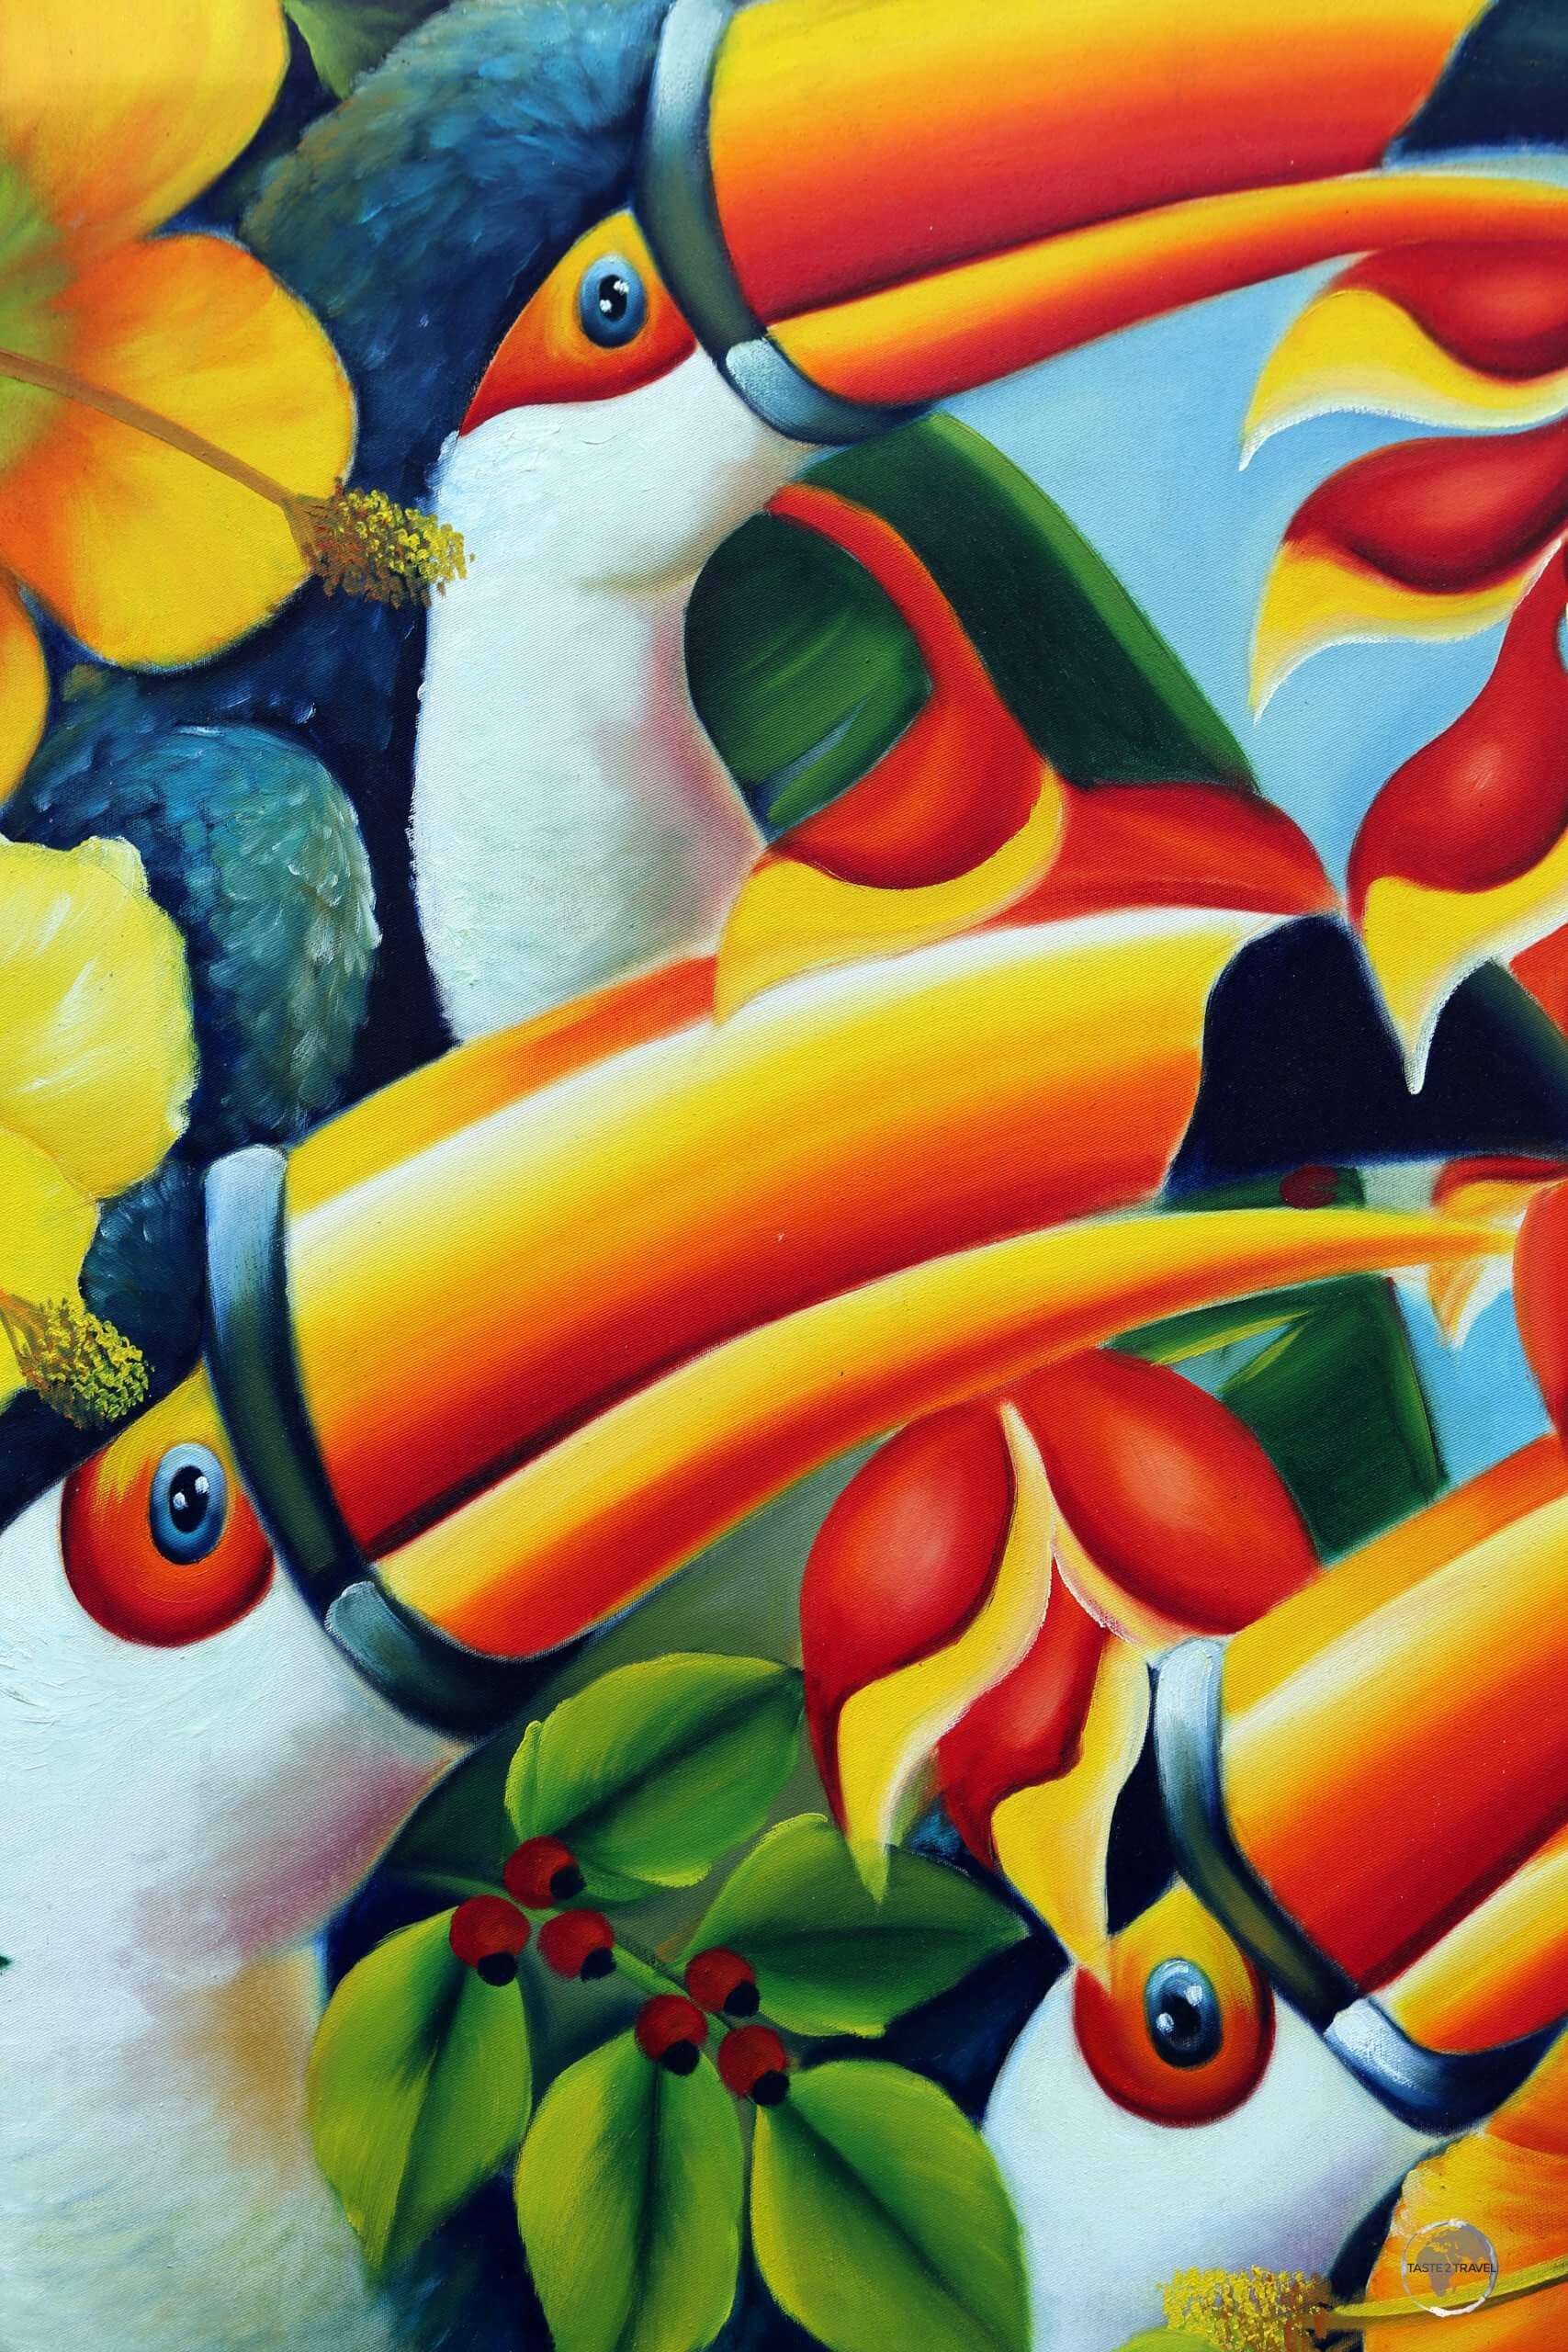 Colourful artwork in Salvador, Brazil.